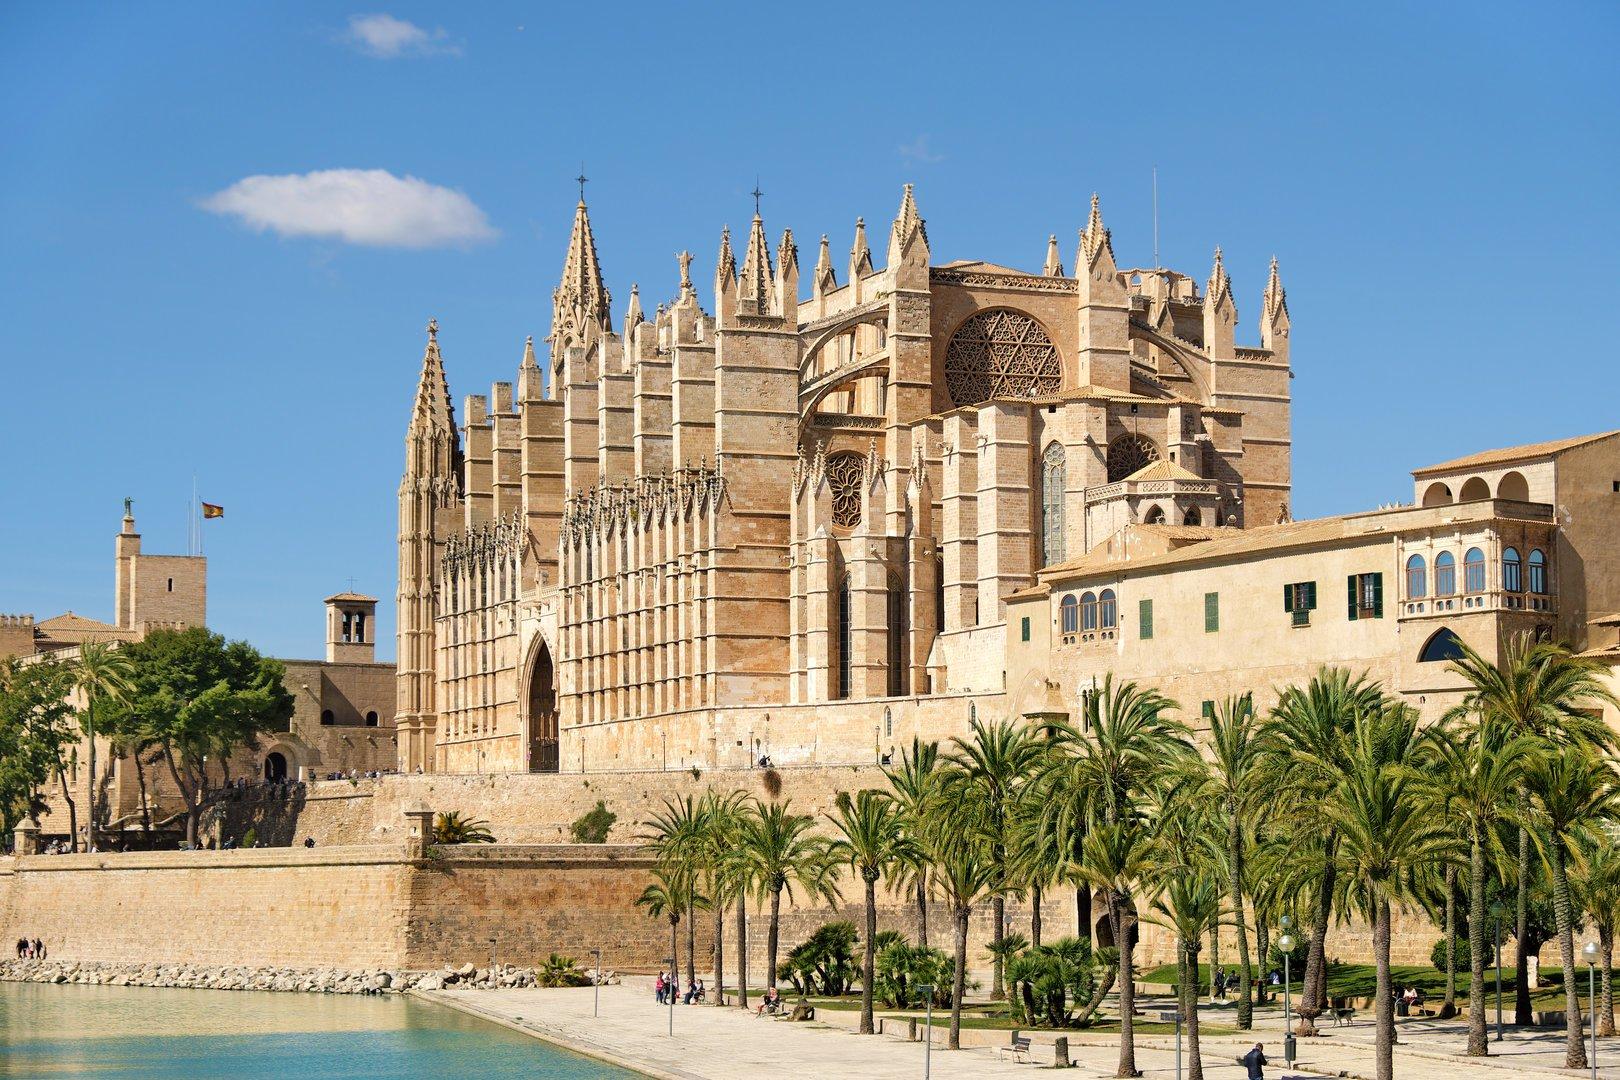 geführte ausflug Palma de Mallorca